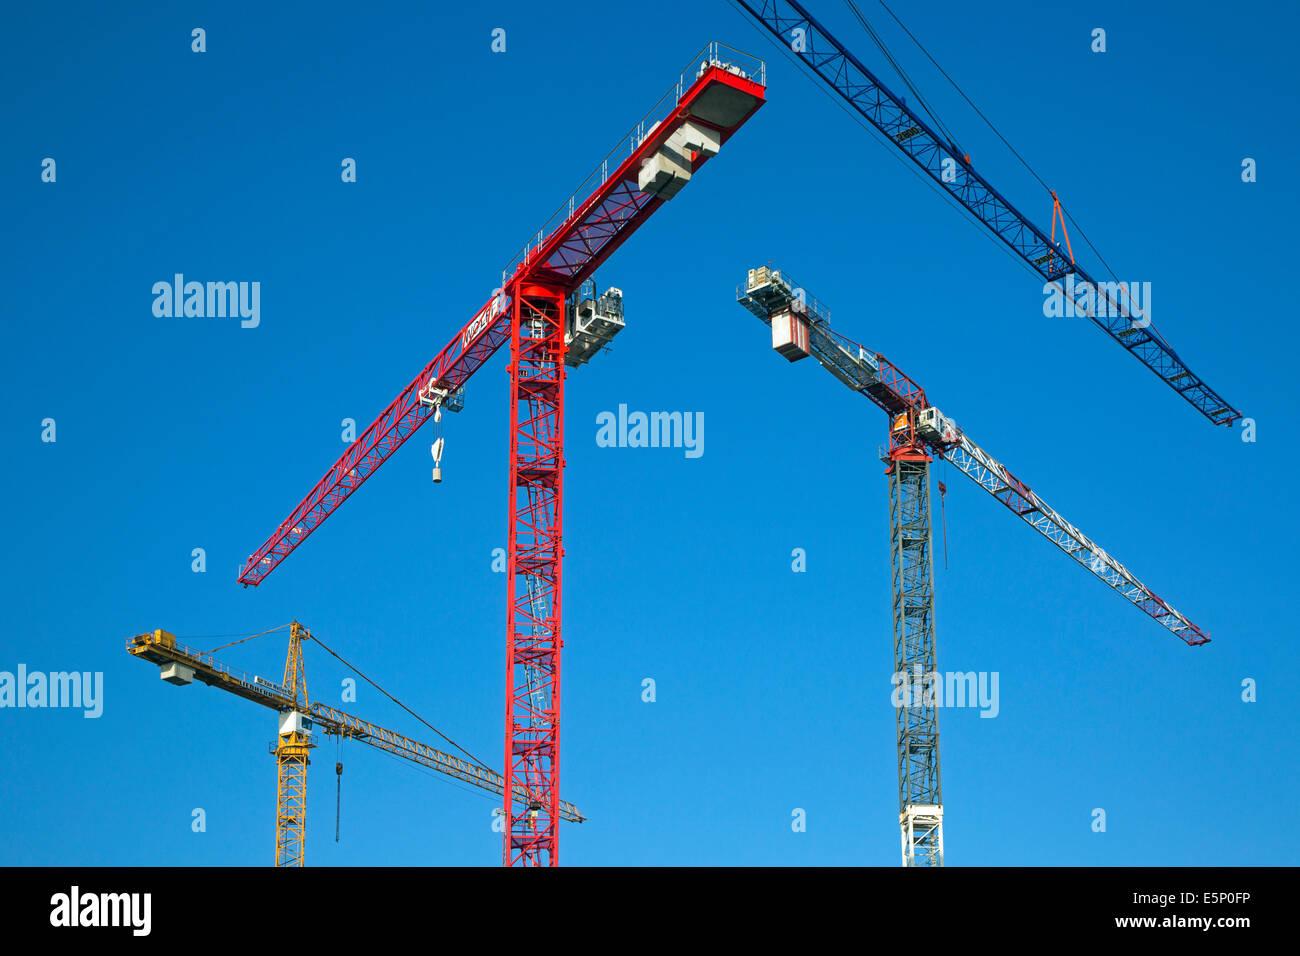 Baukräne / Turmdrehkran gegen blauen Himmel Stockbild